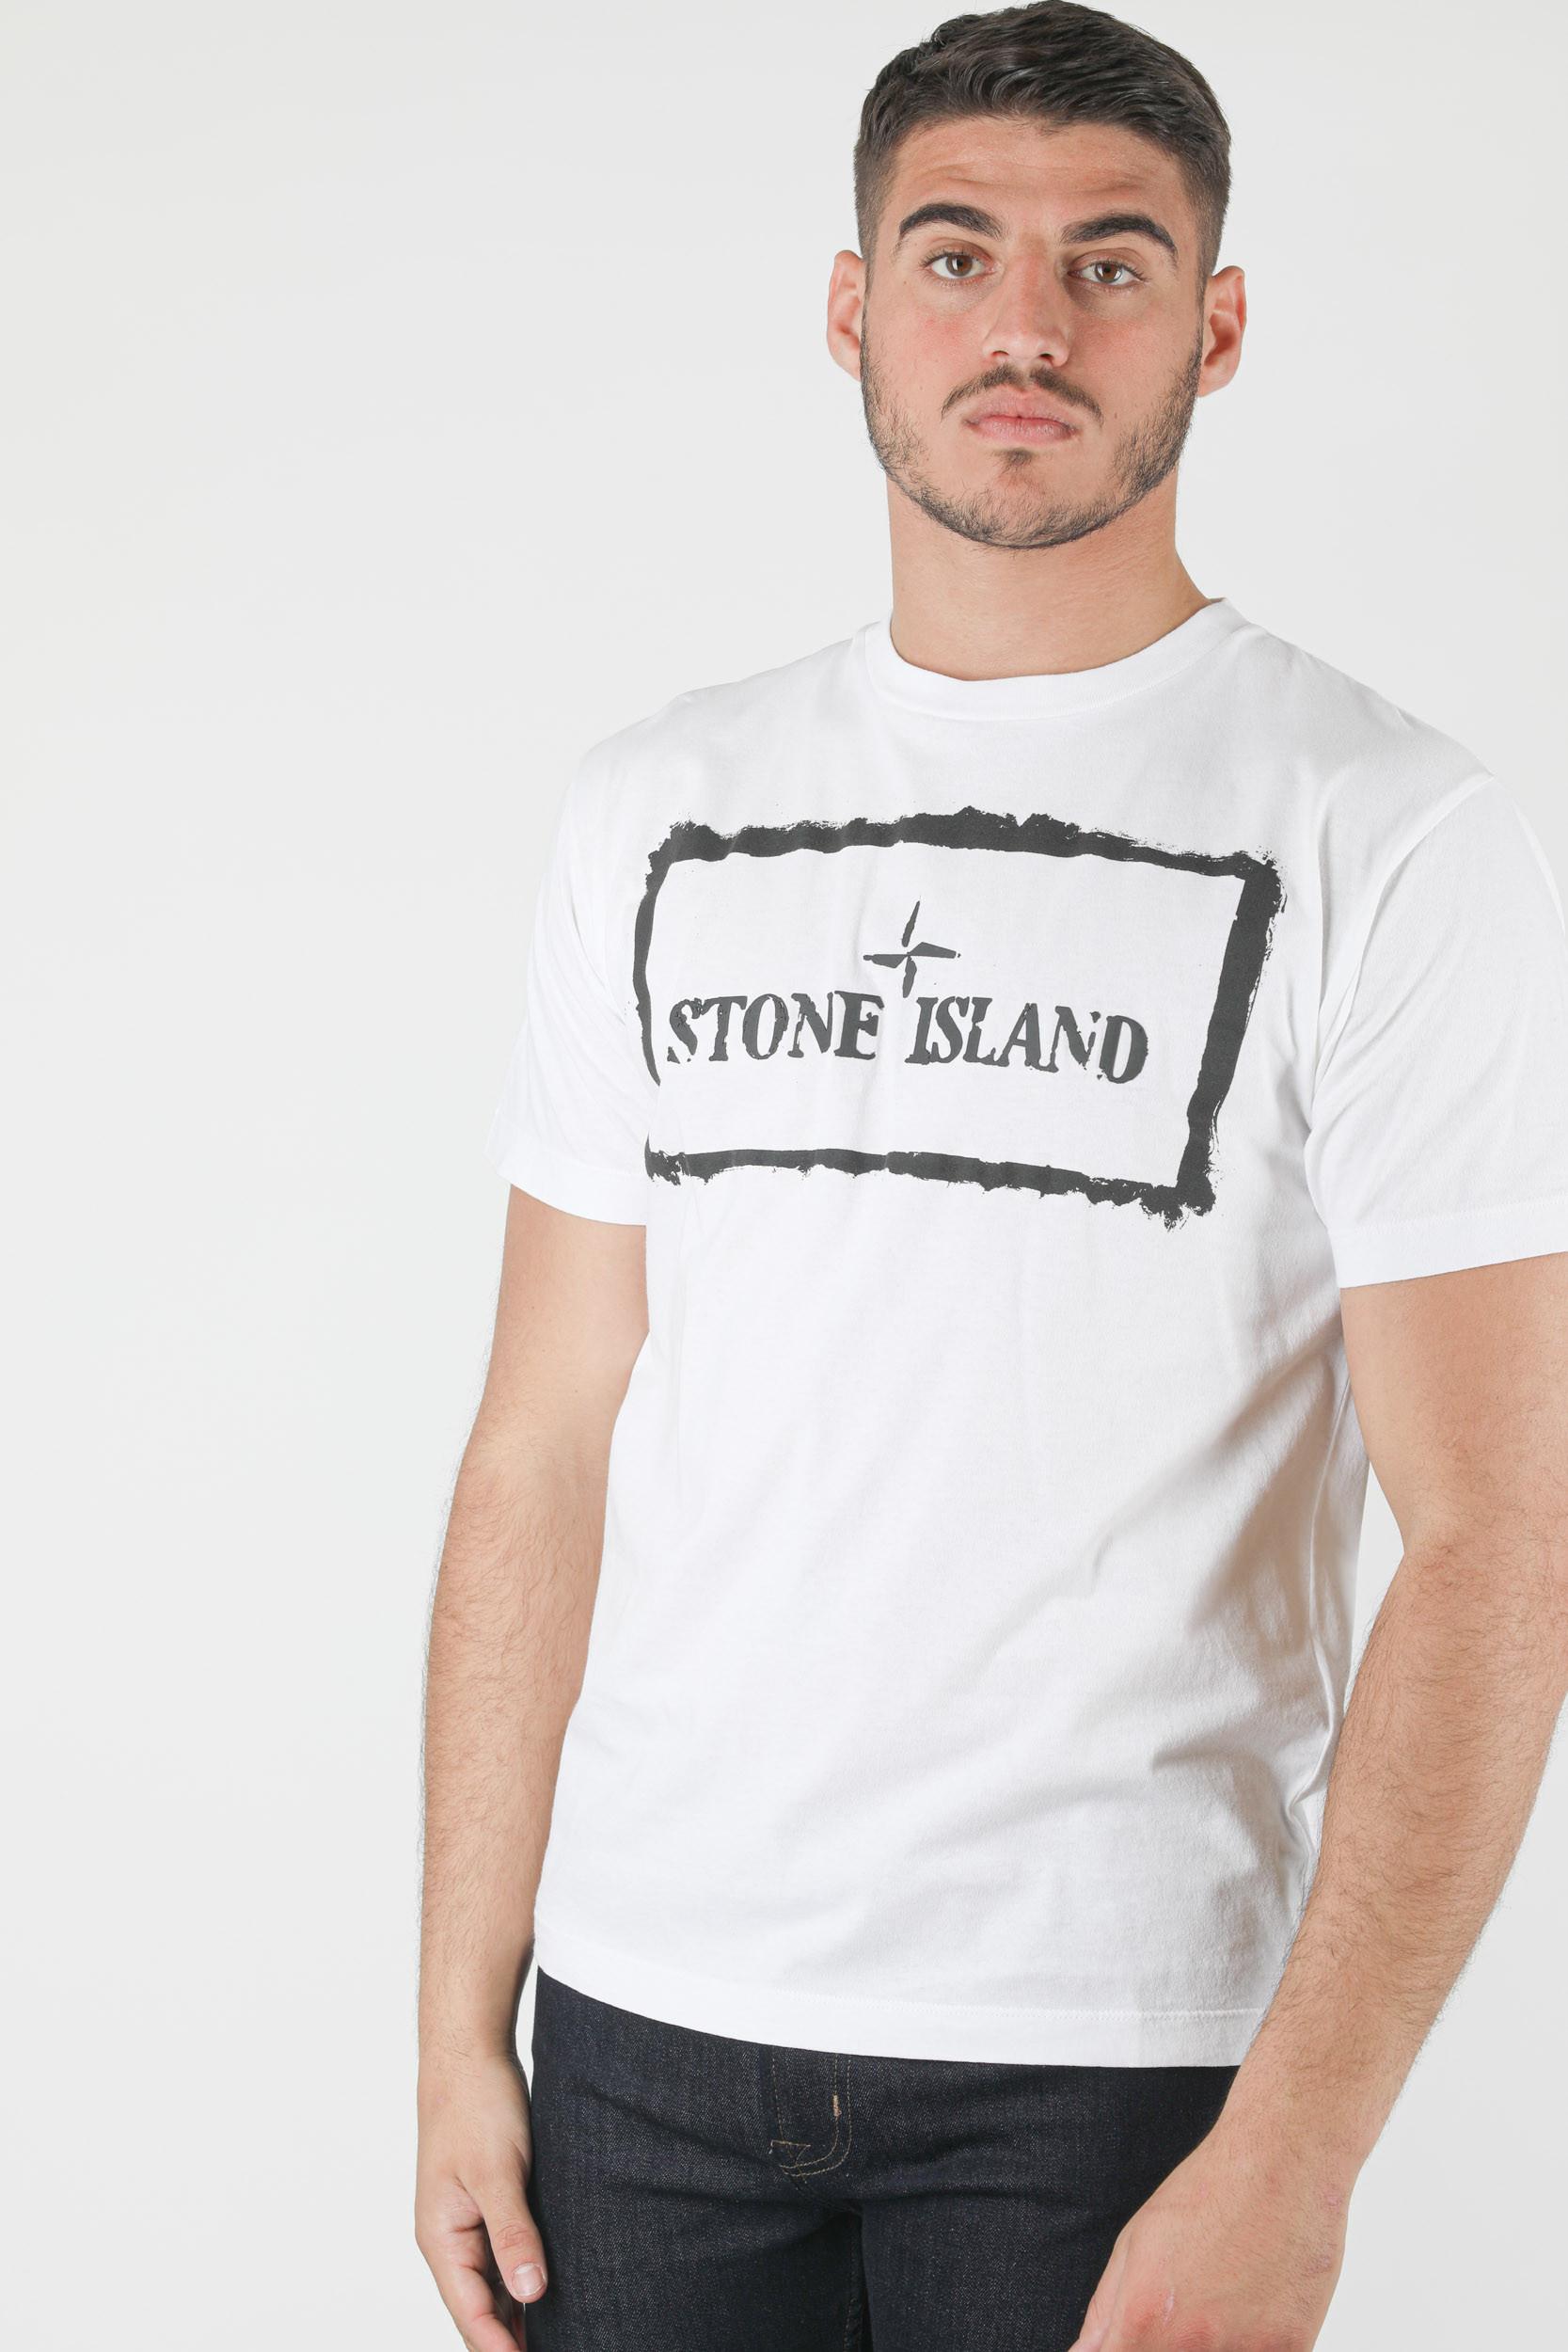 T-SHIRT STONE ISLAND BLANC EFFET PEINTURE NOIR 74152NS80-V0001